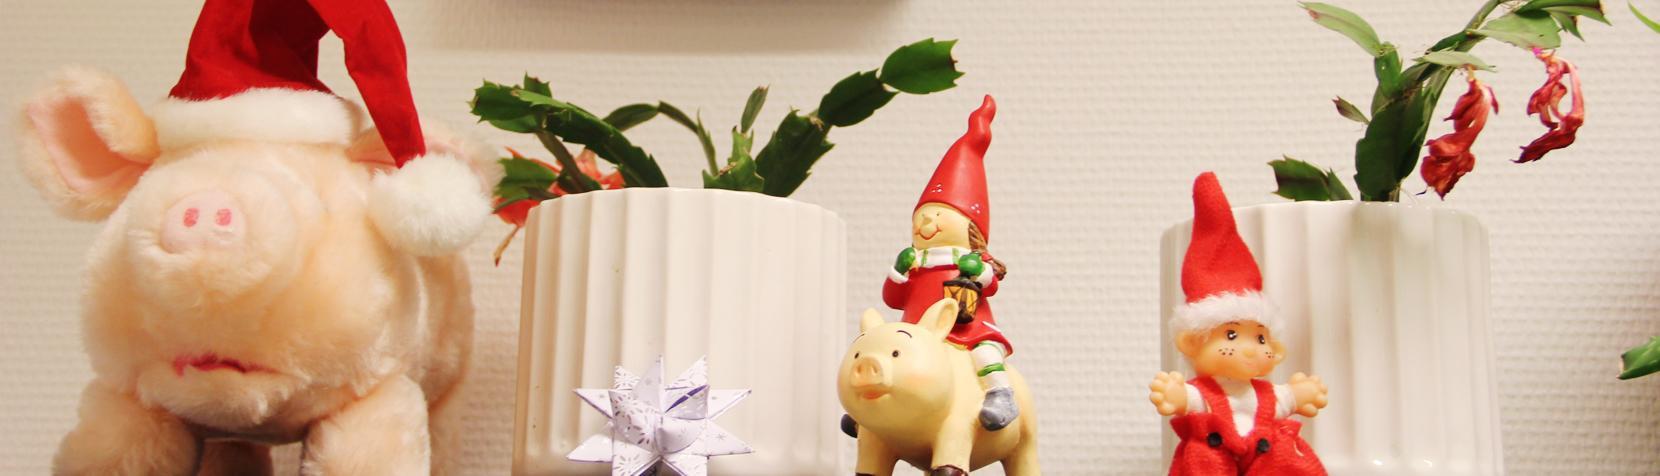 Juleudsmykning